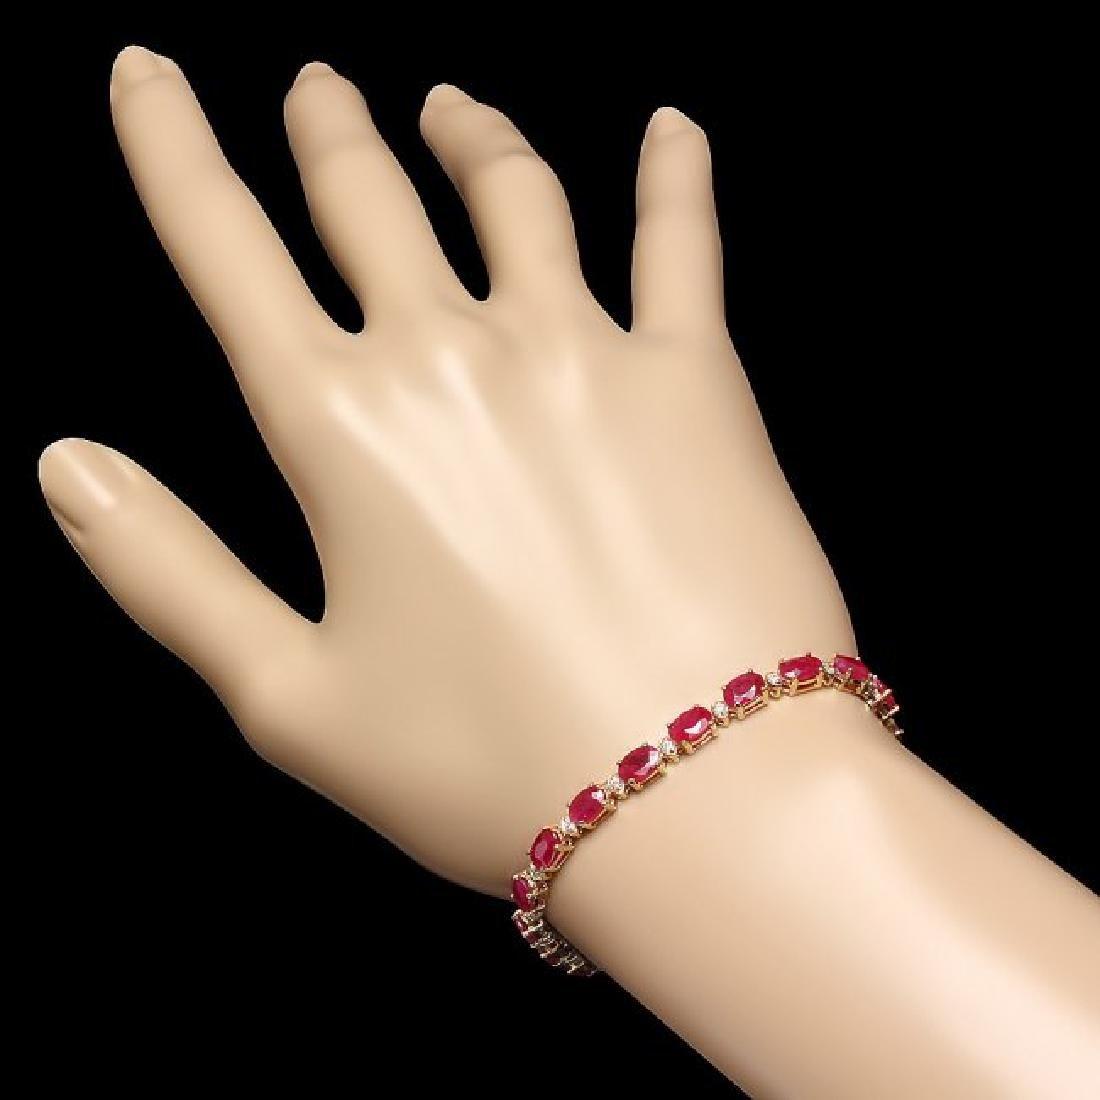 14k Gold 11.50ct Ruby 0.40ct Diamond Bracelet - 4